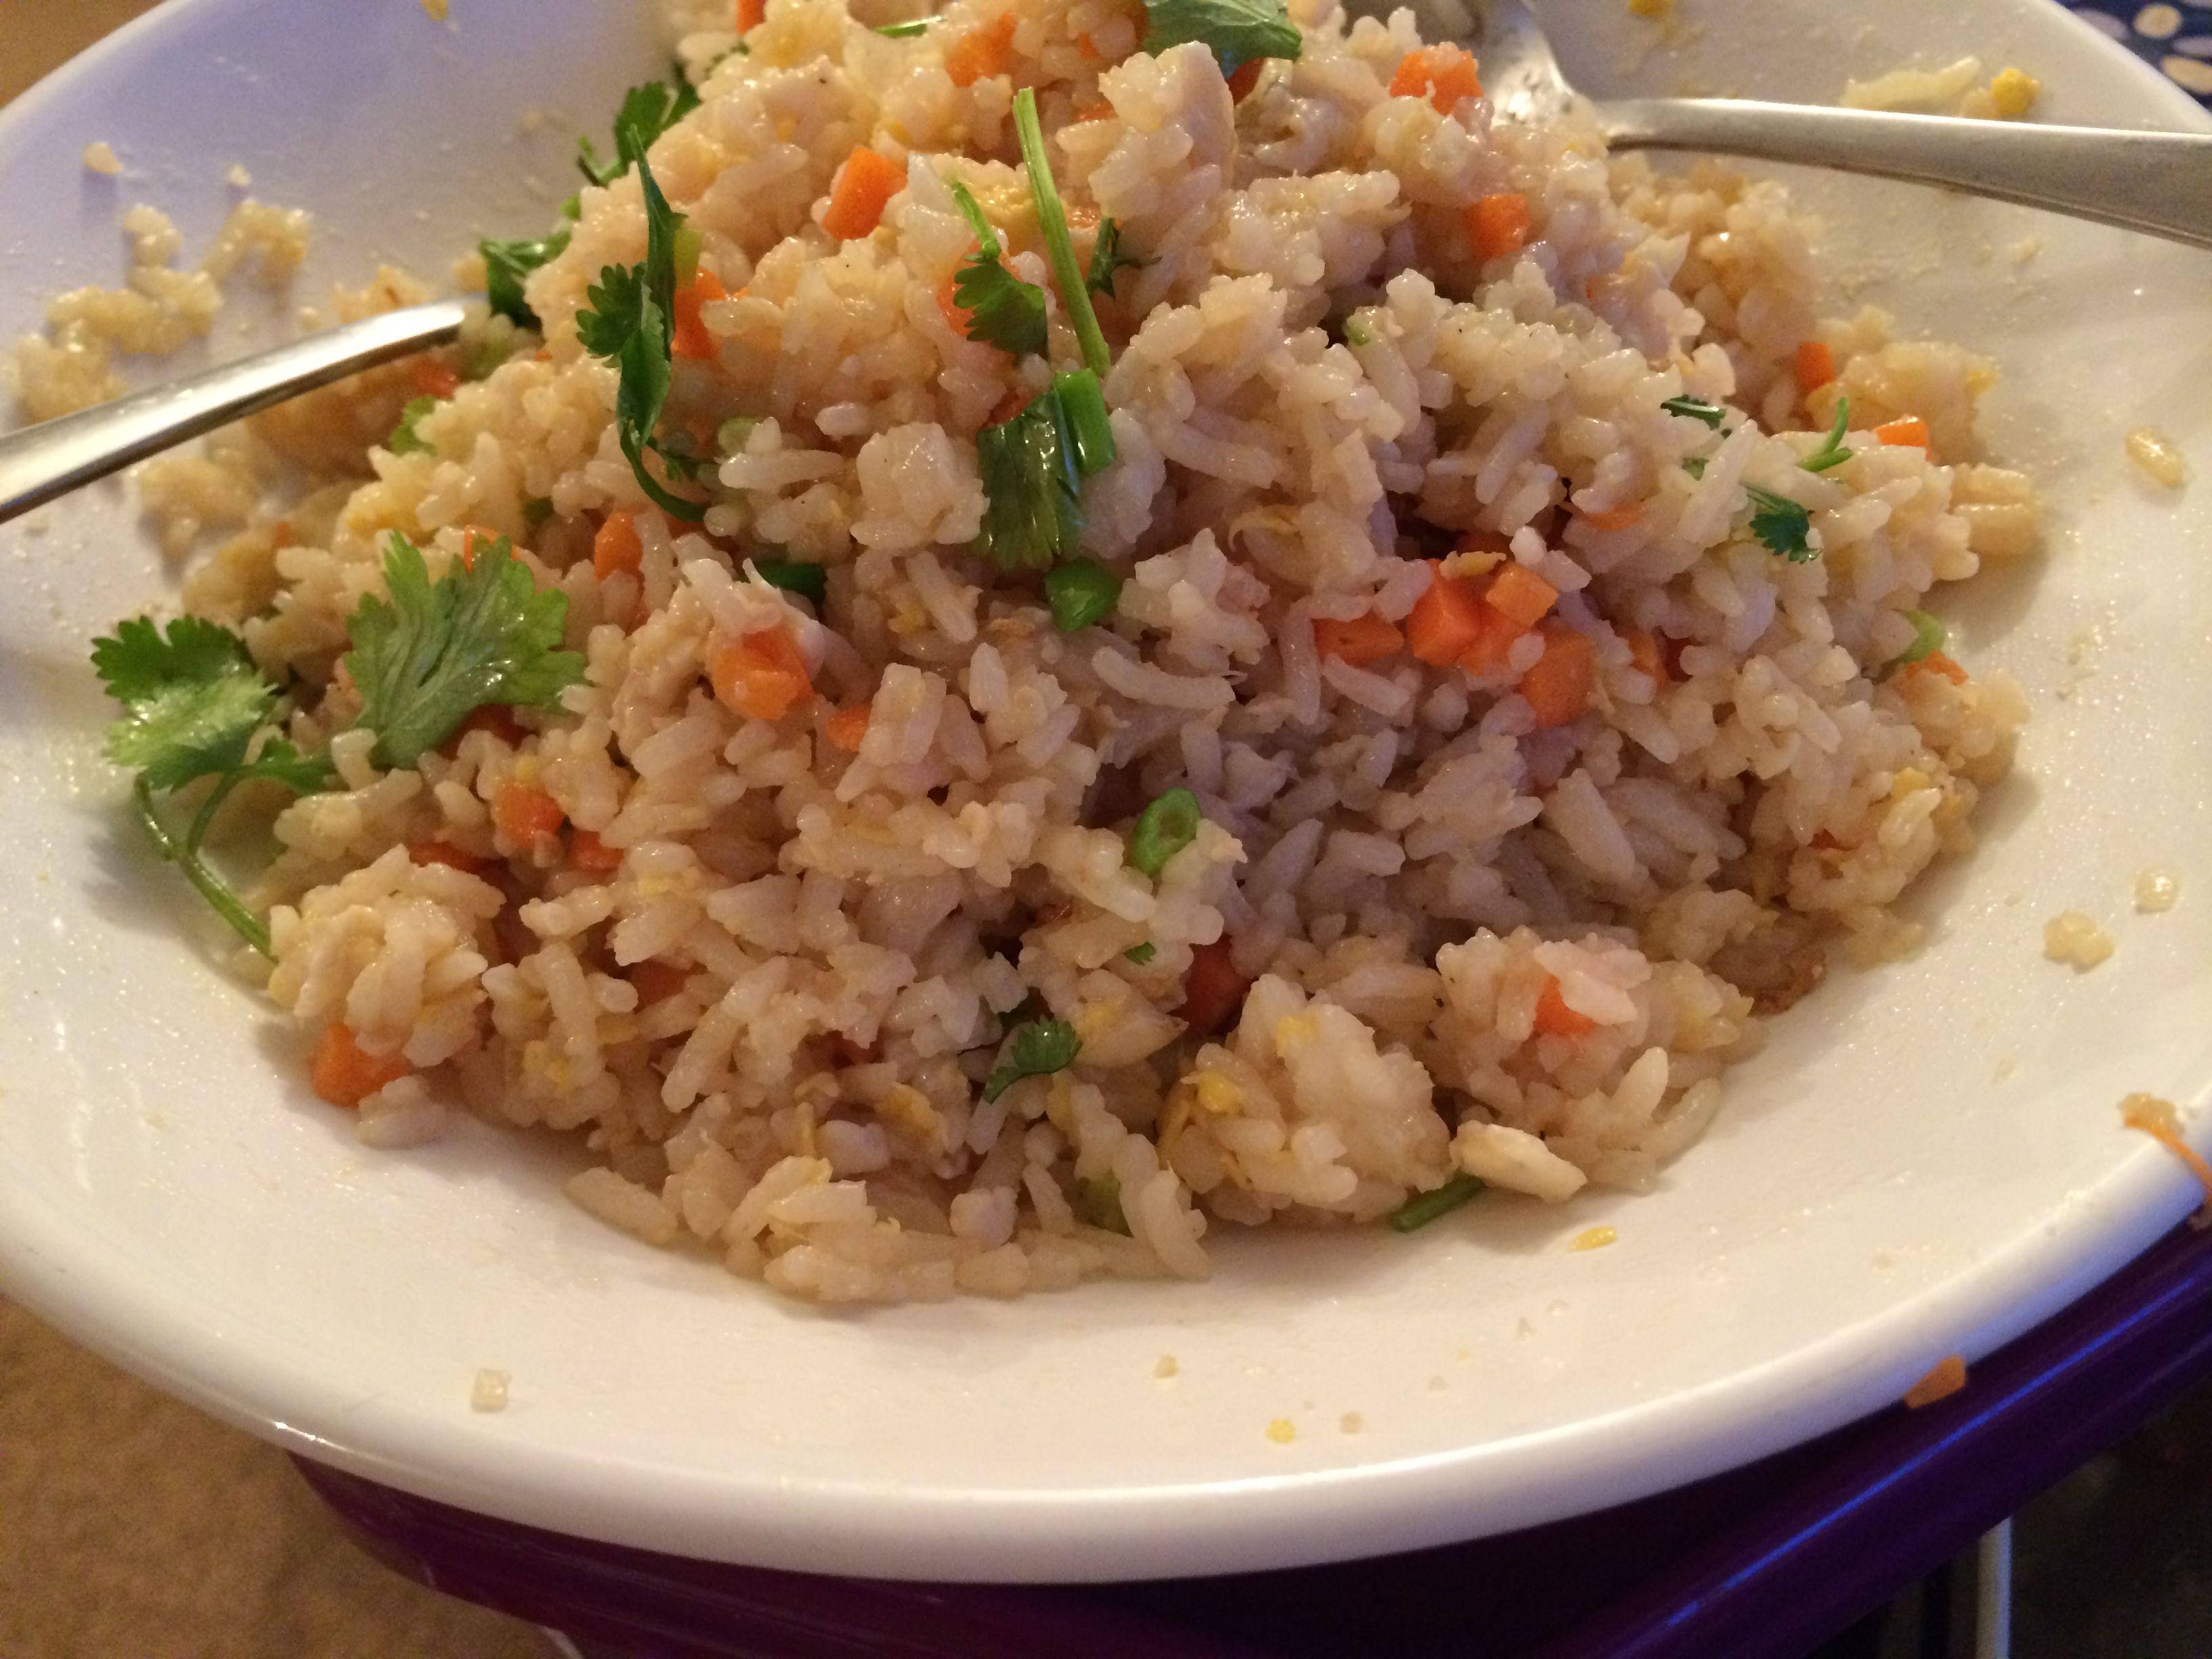 Eggs fried rice